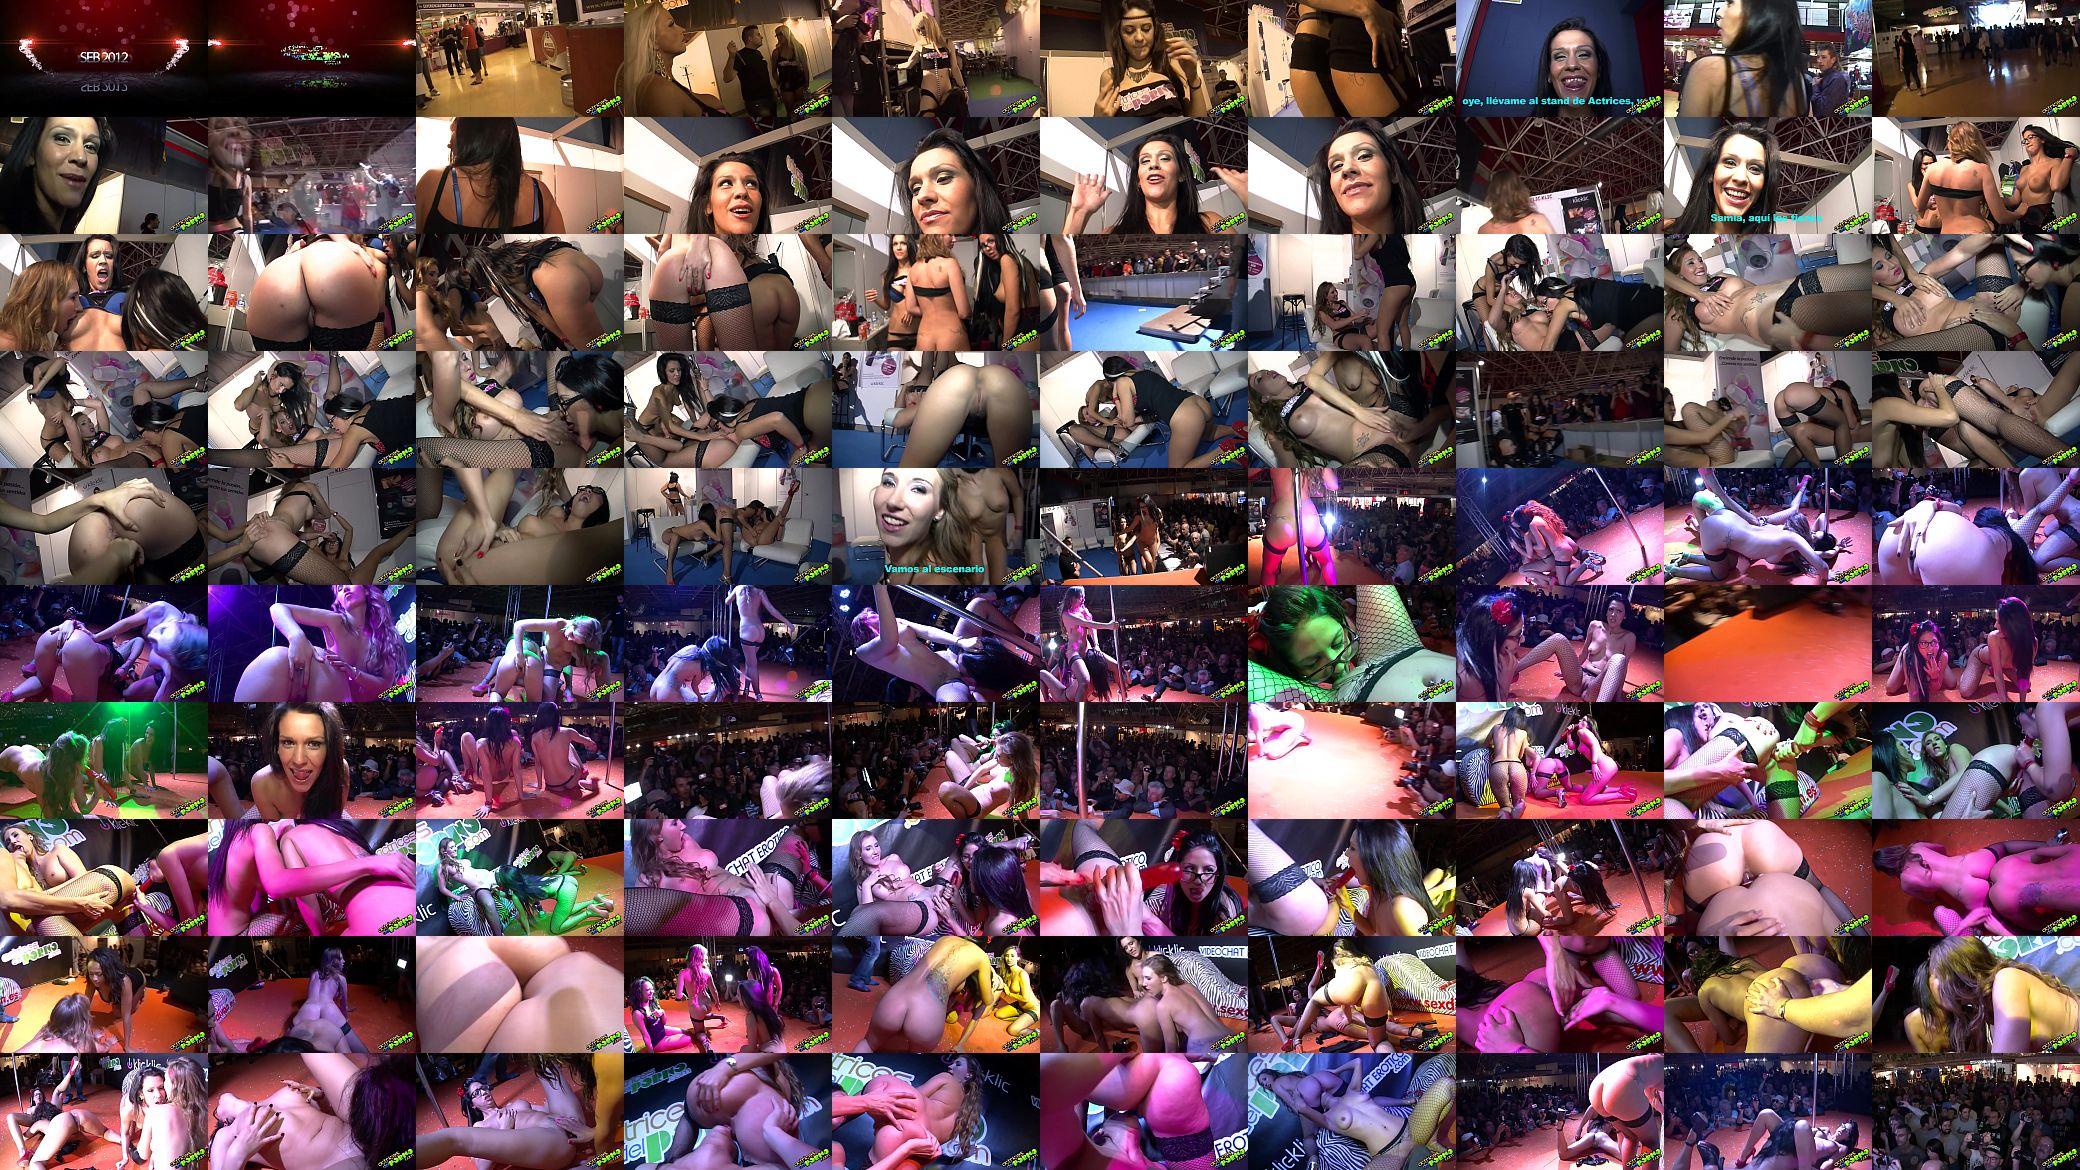 Actriz Porno Española Alana trío lésbico seb 2012 - xvideos